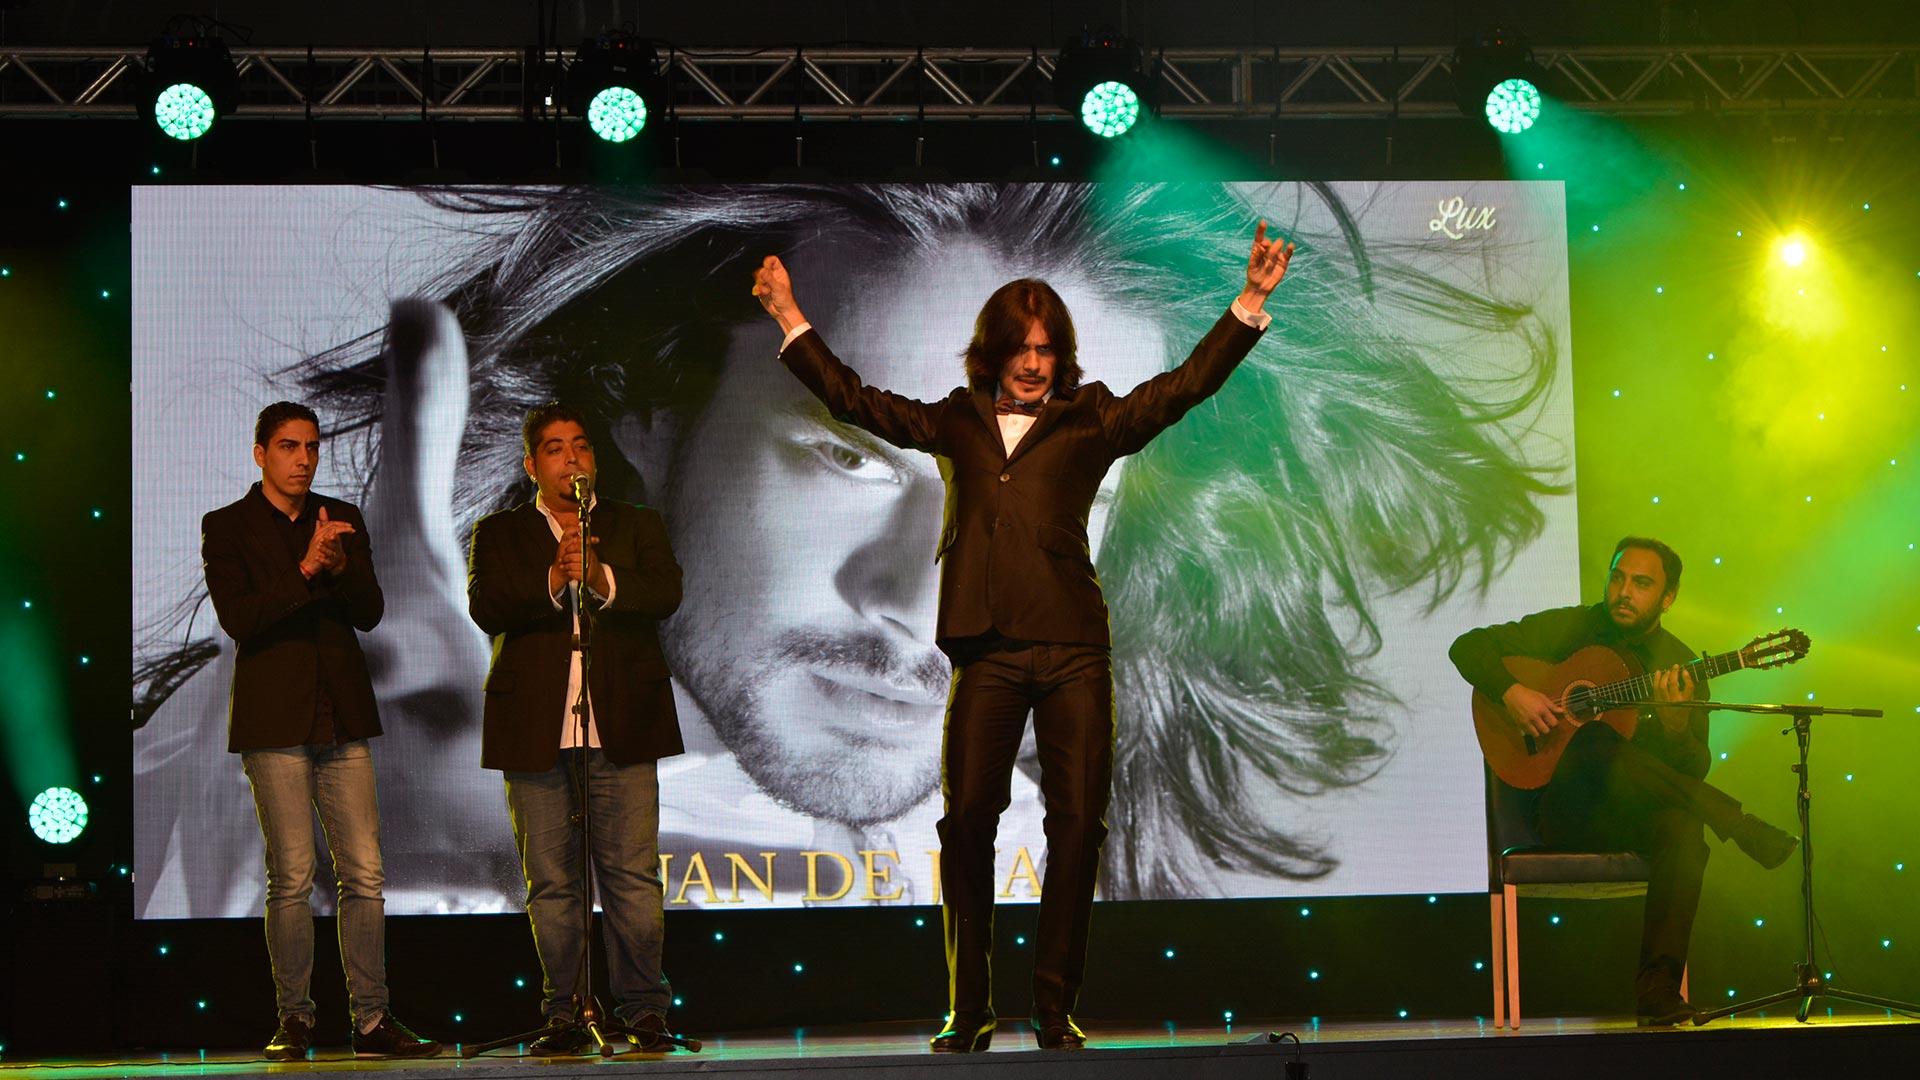 Juan de Juan dancing Flamenco at Luxury Advertising Awards - www.arianasoffici.com